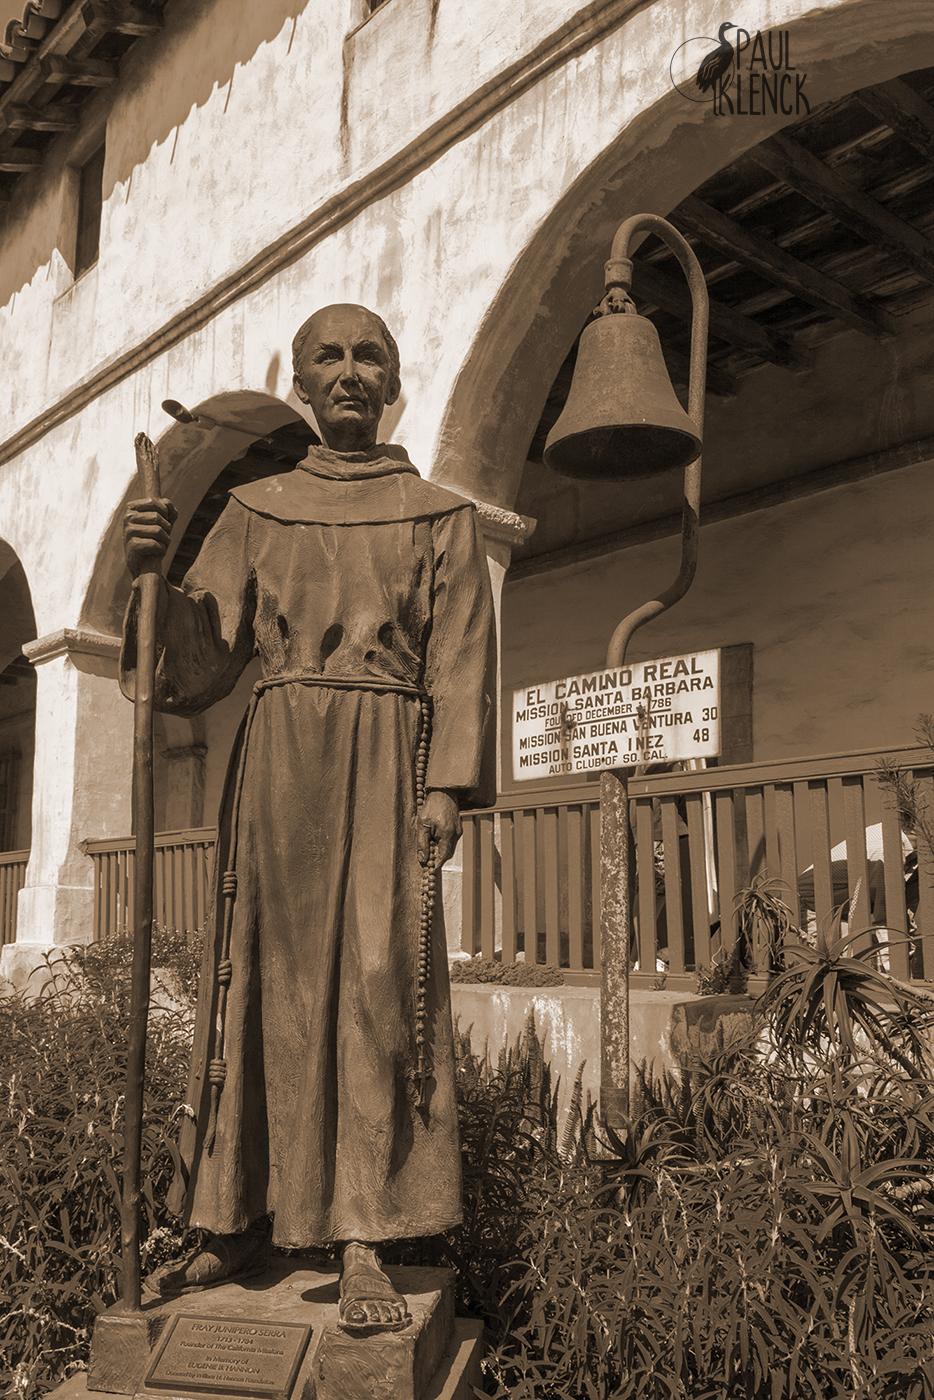 Saint Junipero Serra, Mission Santa Barbara, California